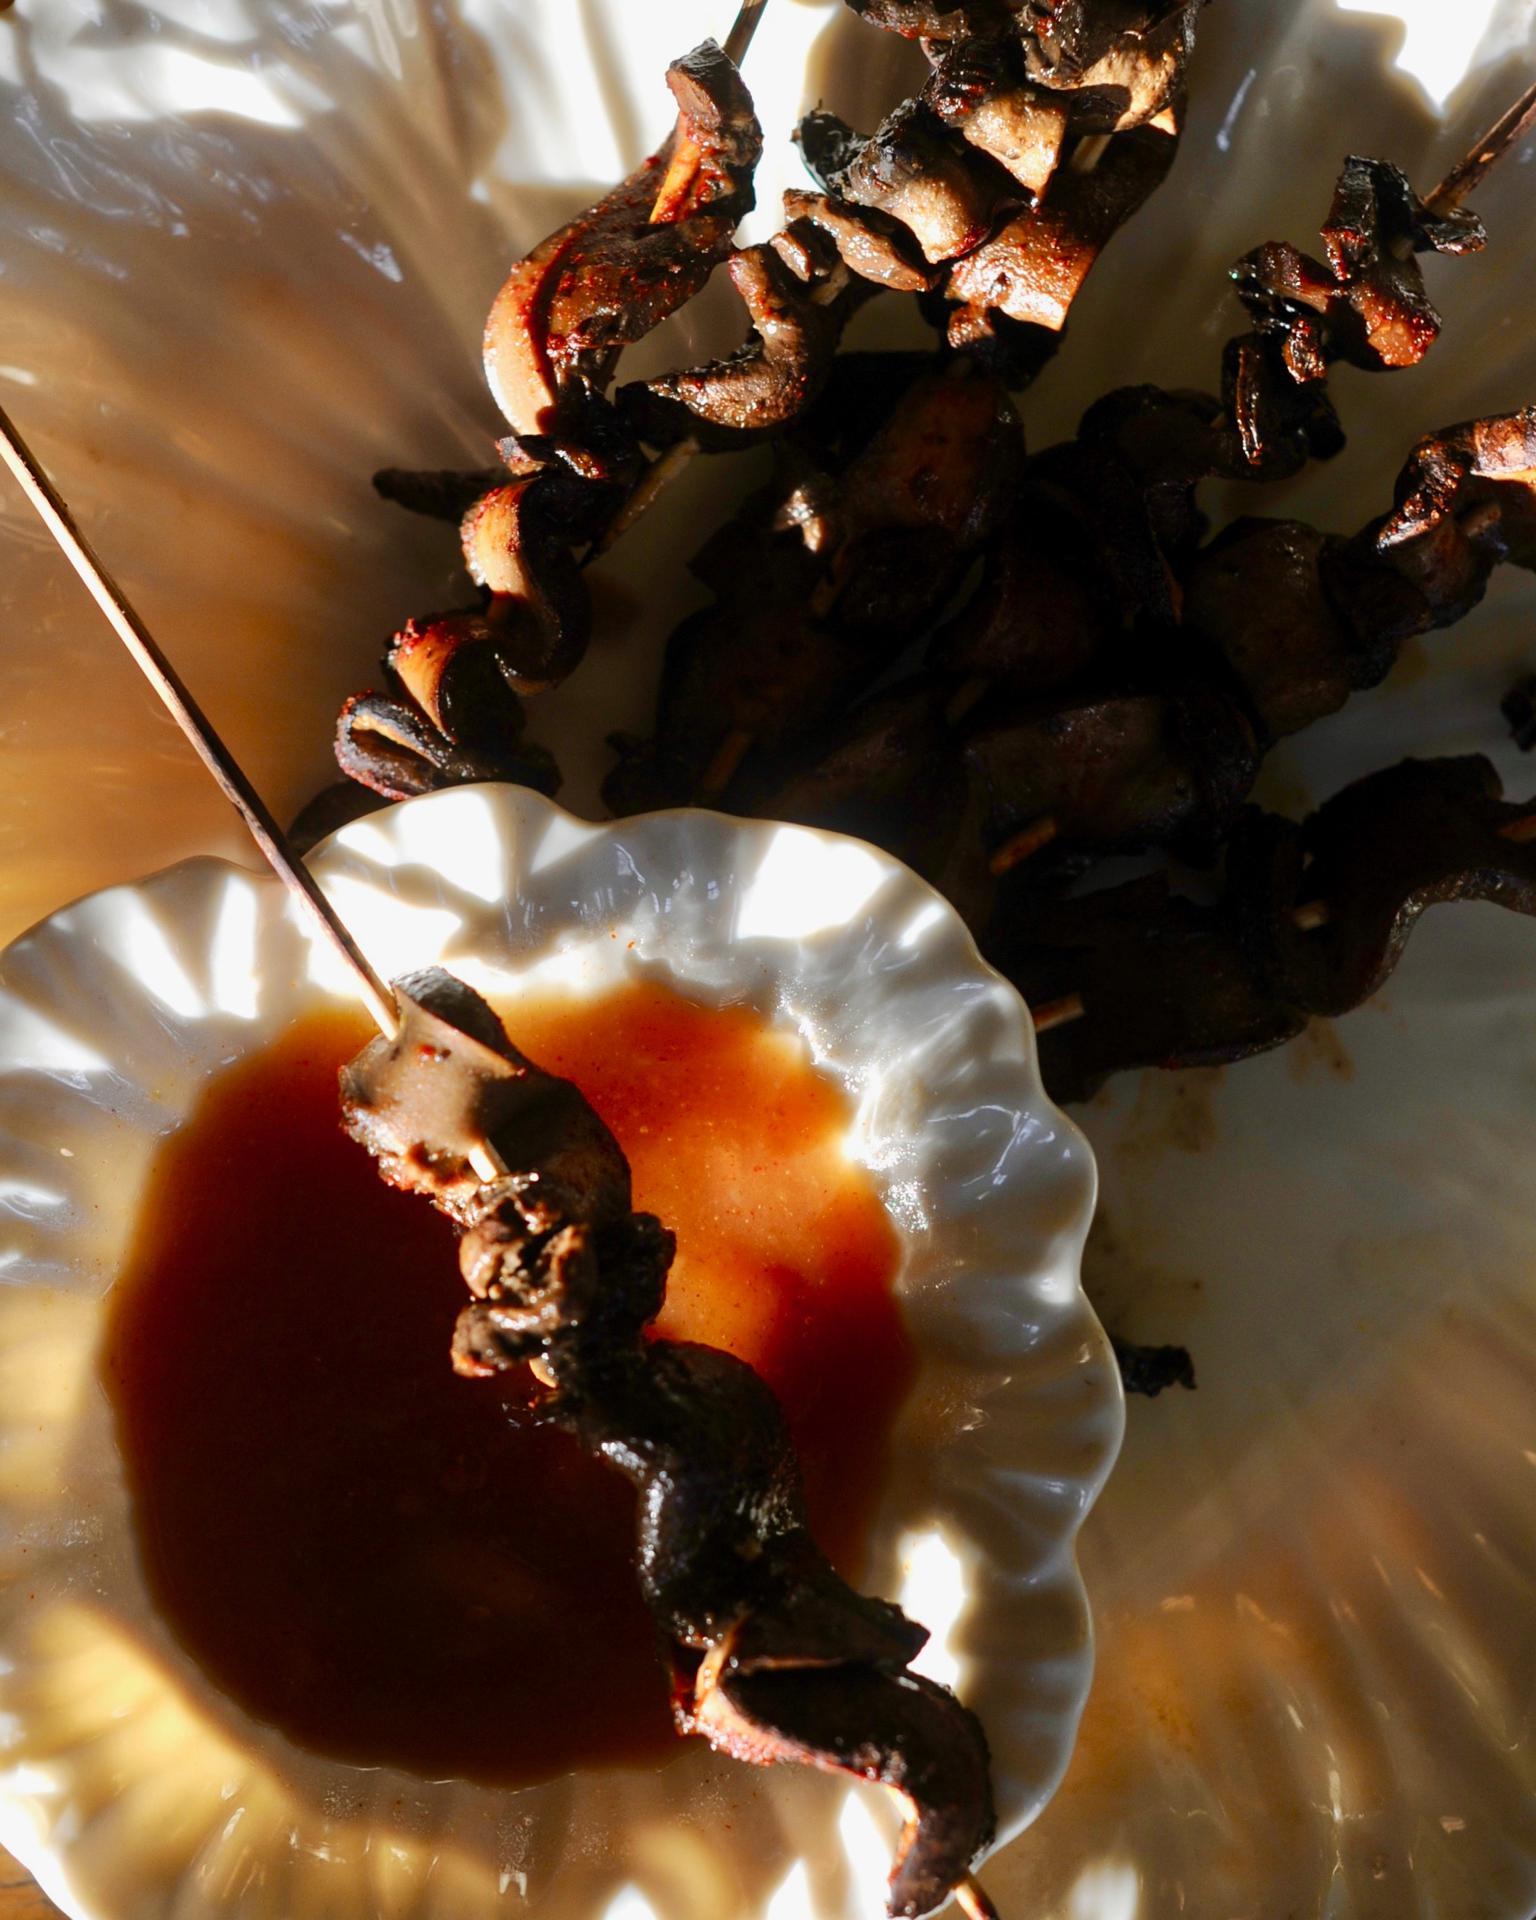 Mushroom satay skewer resting on mango dipping sauce in white bowl